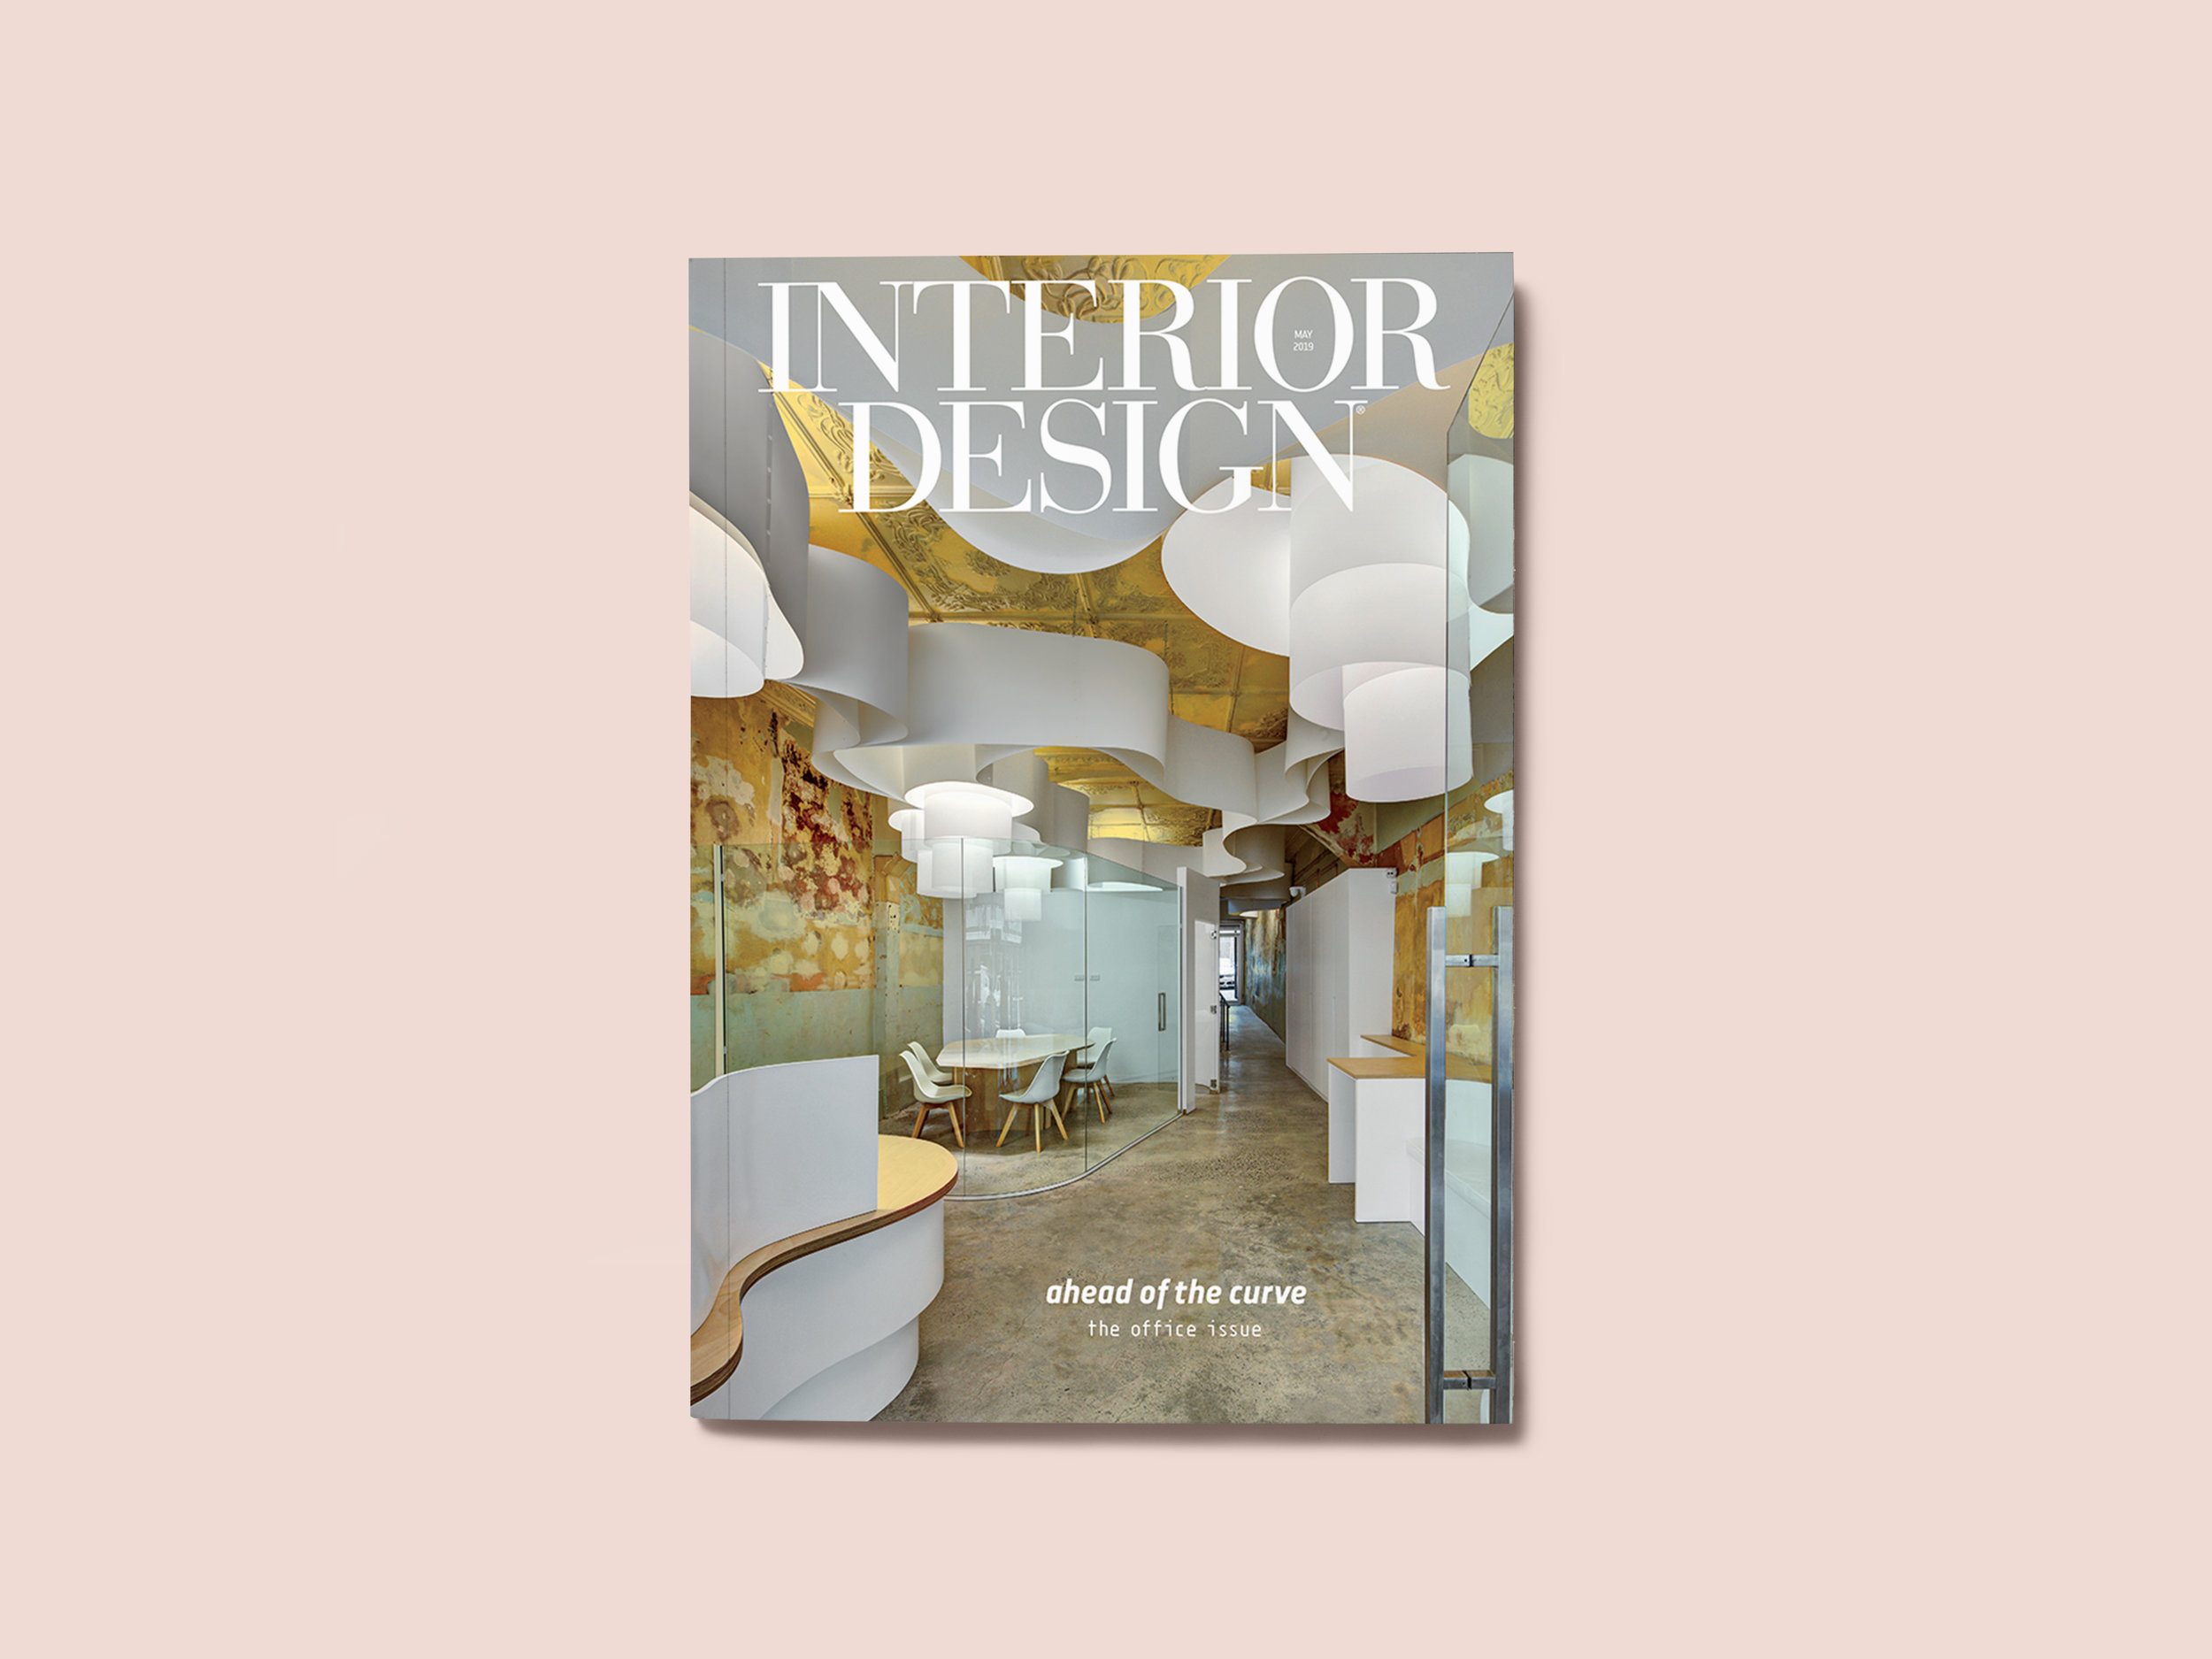 Interior Design Zephyr Cover.jpg